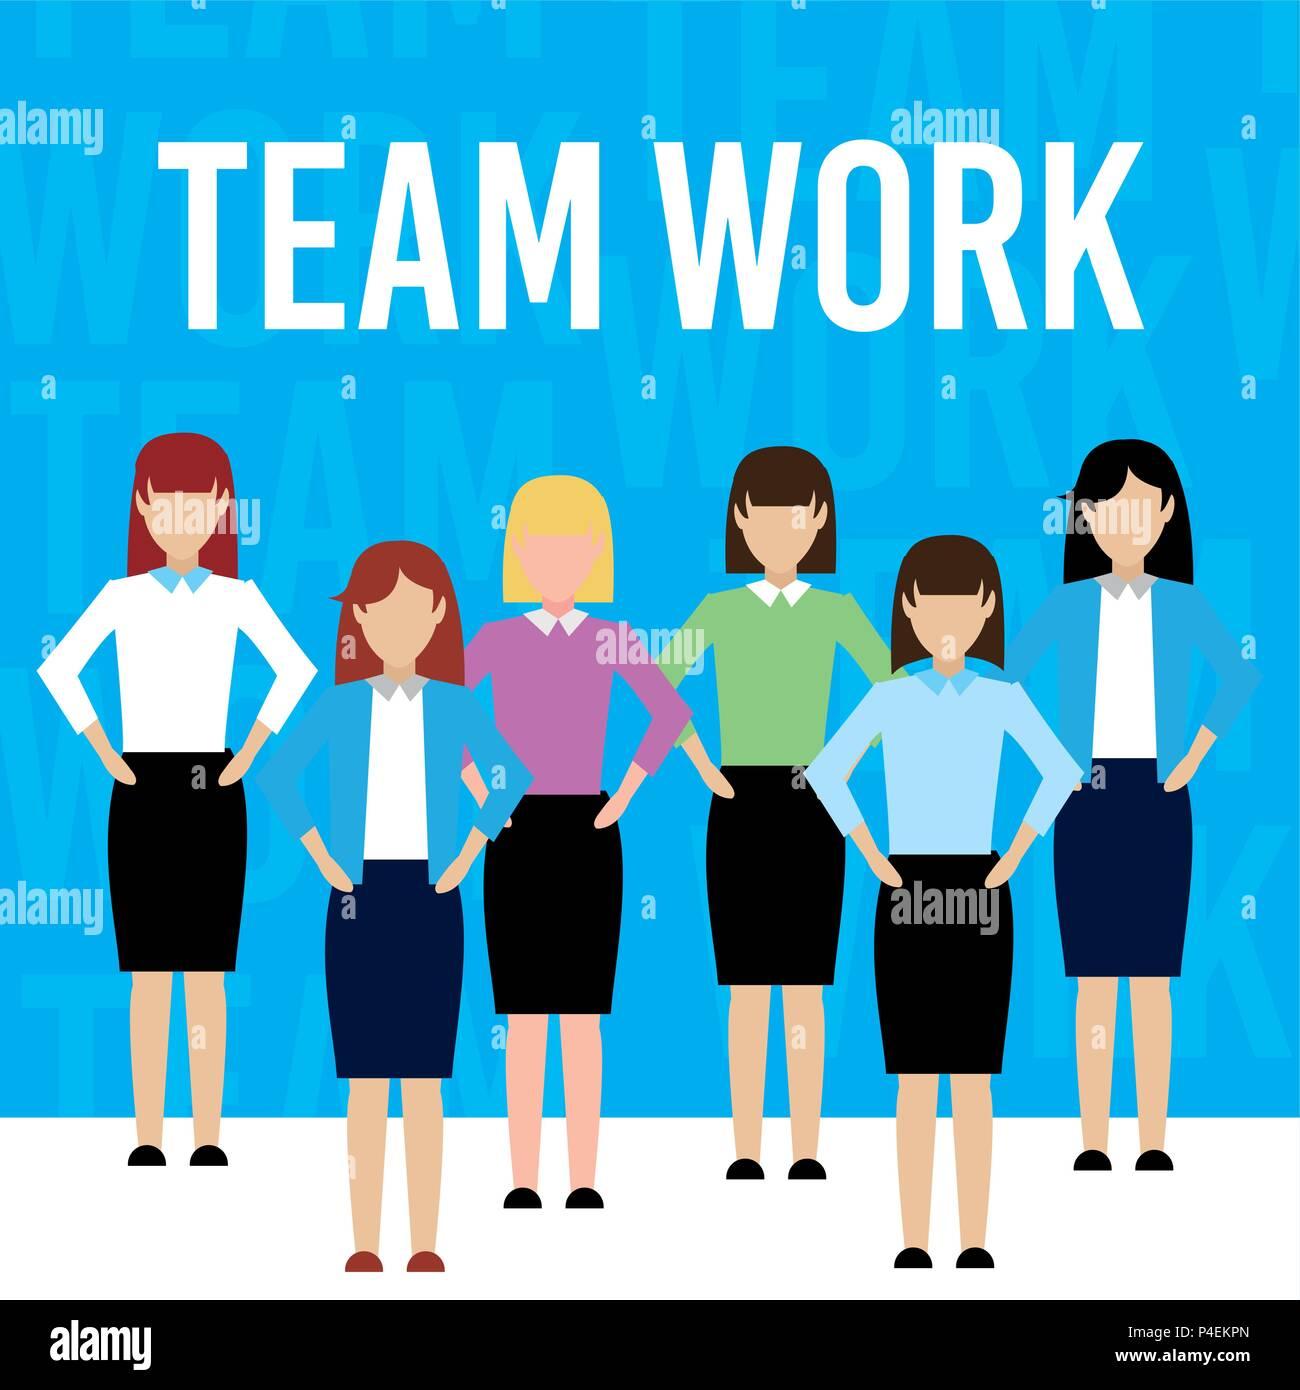 womens teamwork cartoon - Stock Image